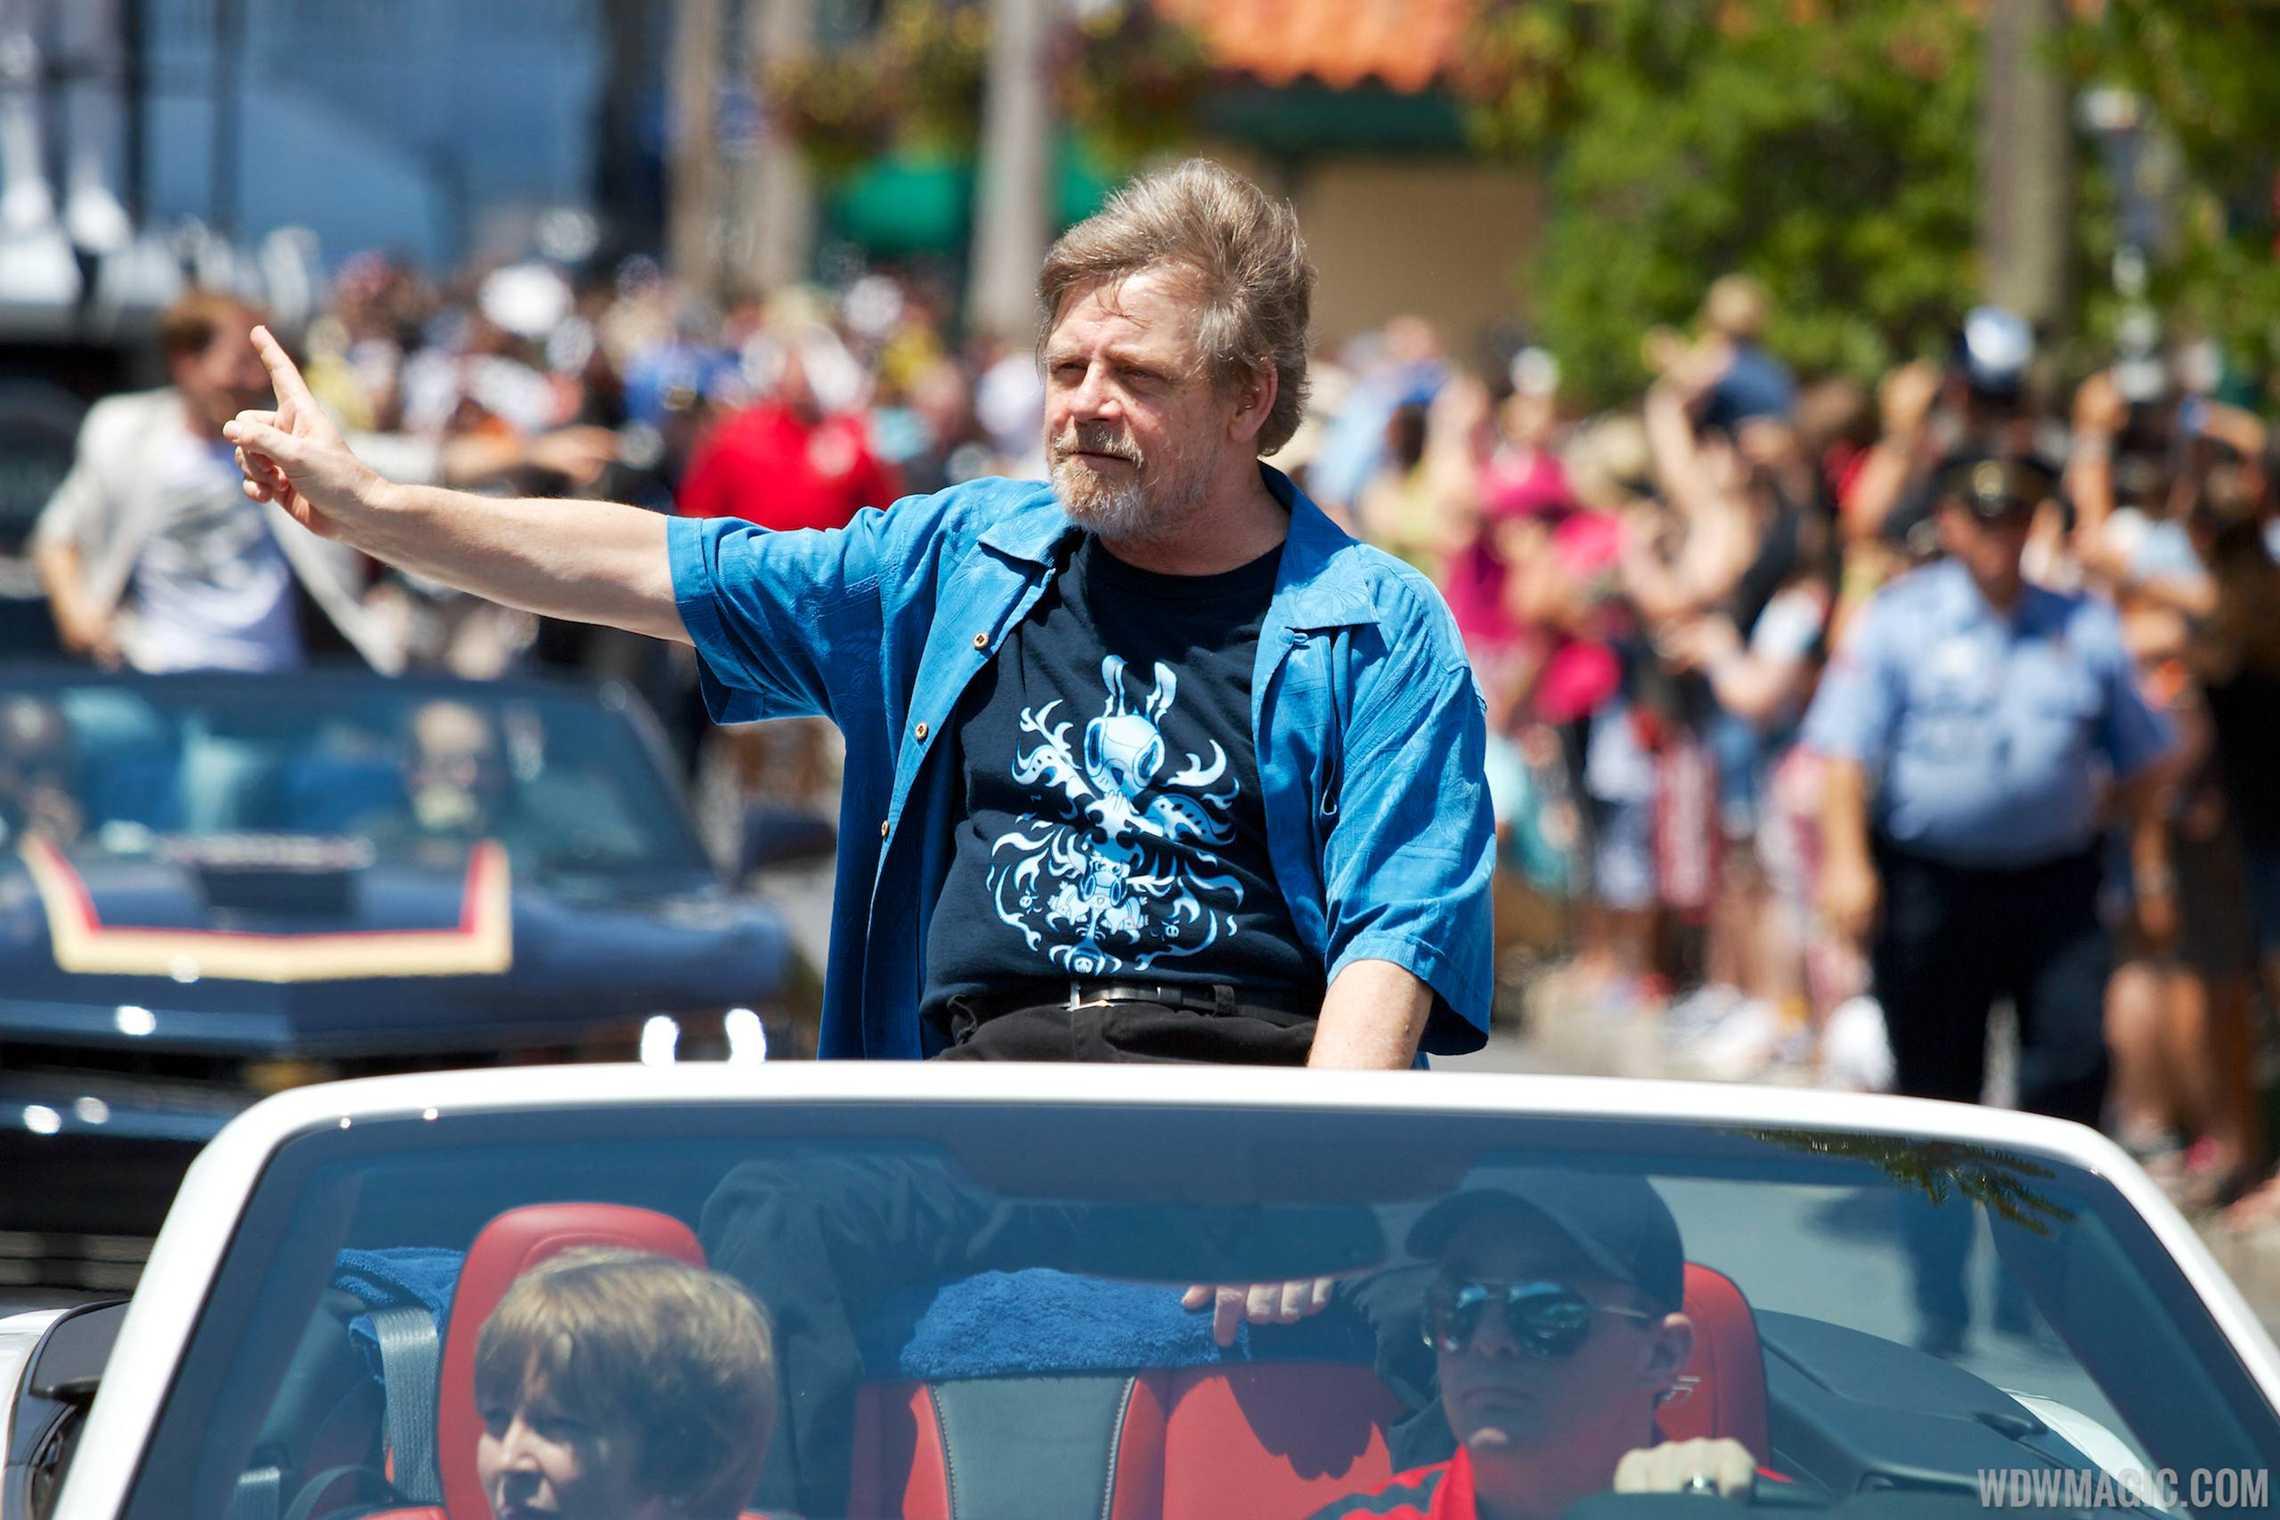 2014 Star Wars Weekends - Weekend 4 Legends of the Force motorcade celebrities - Mark Hamill